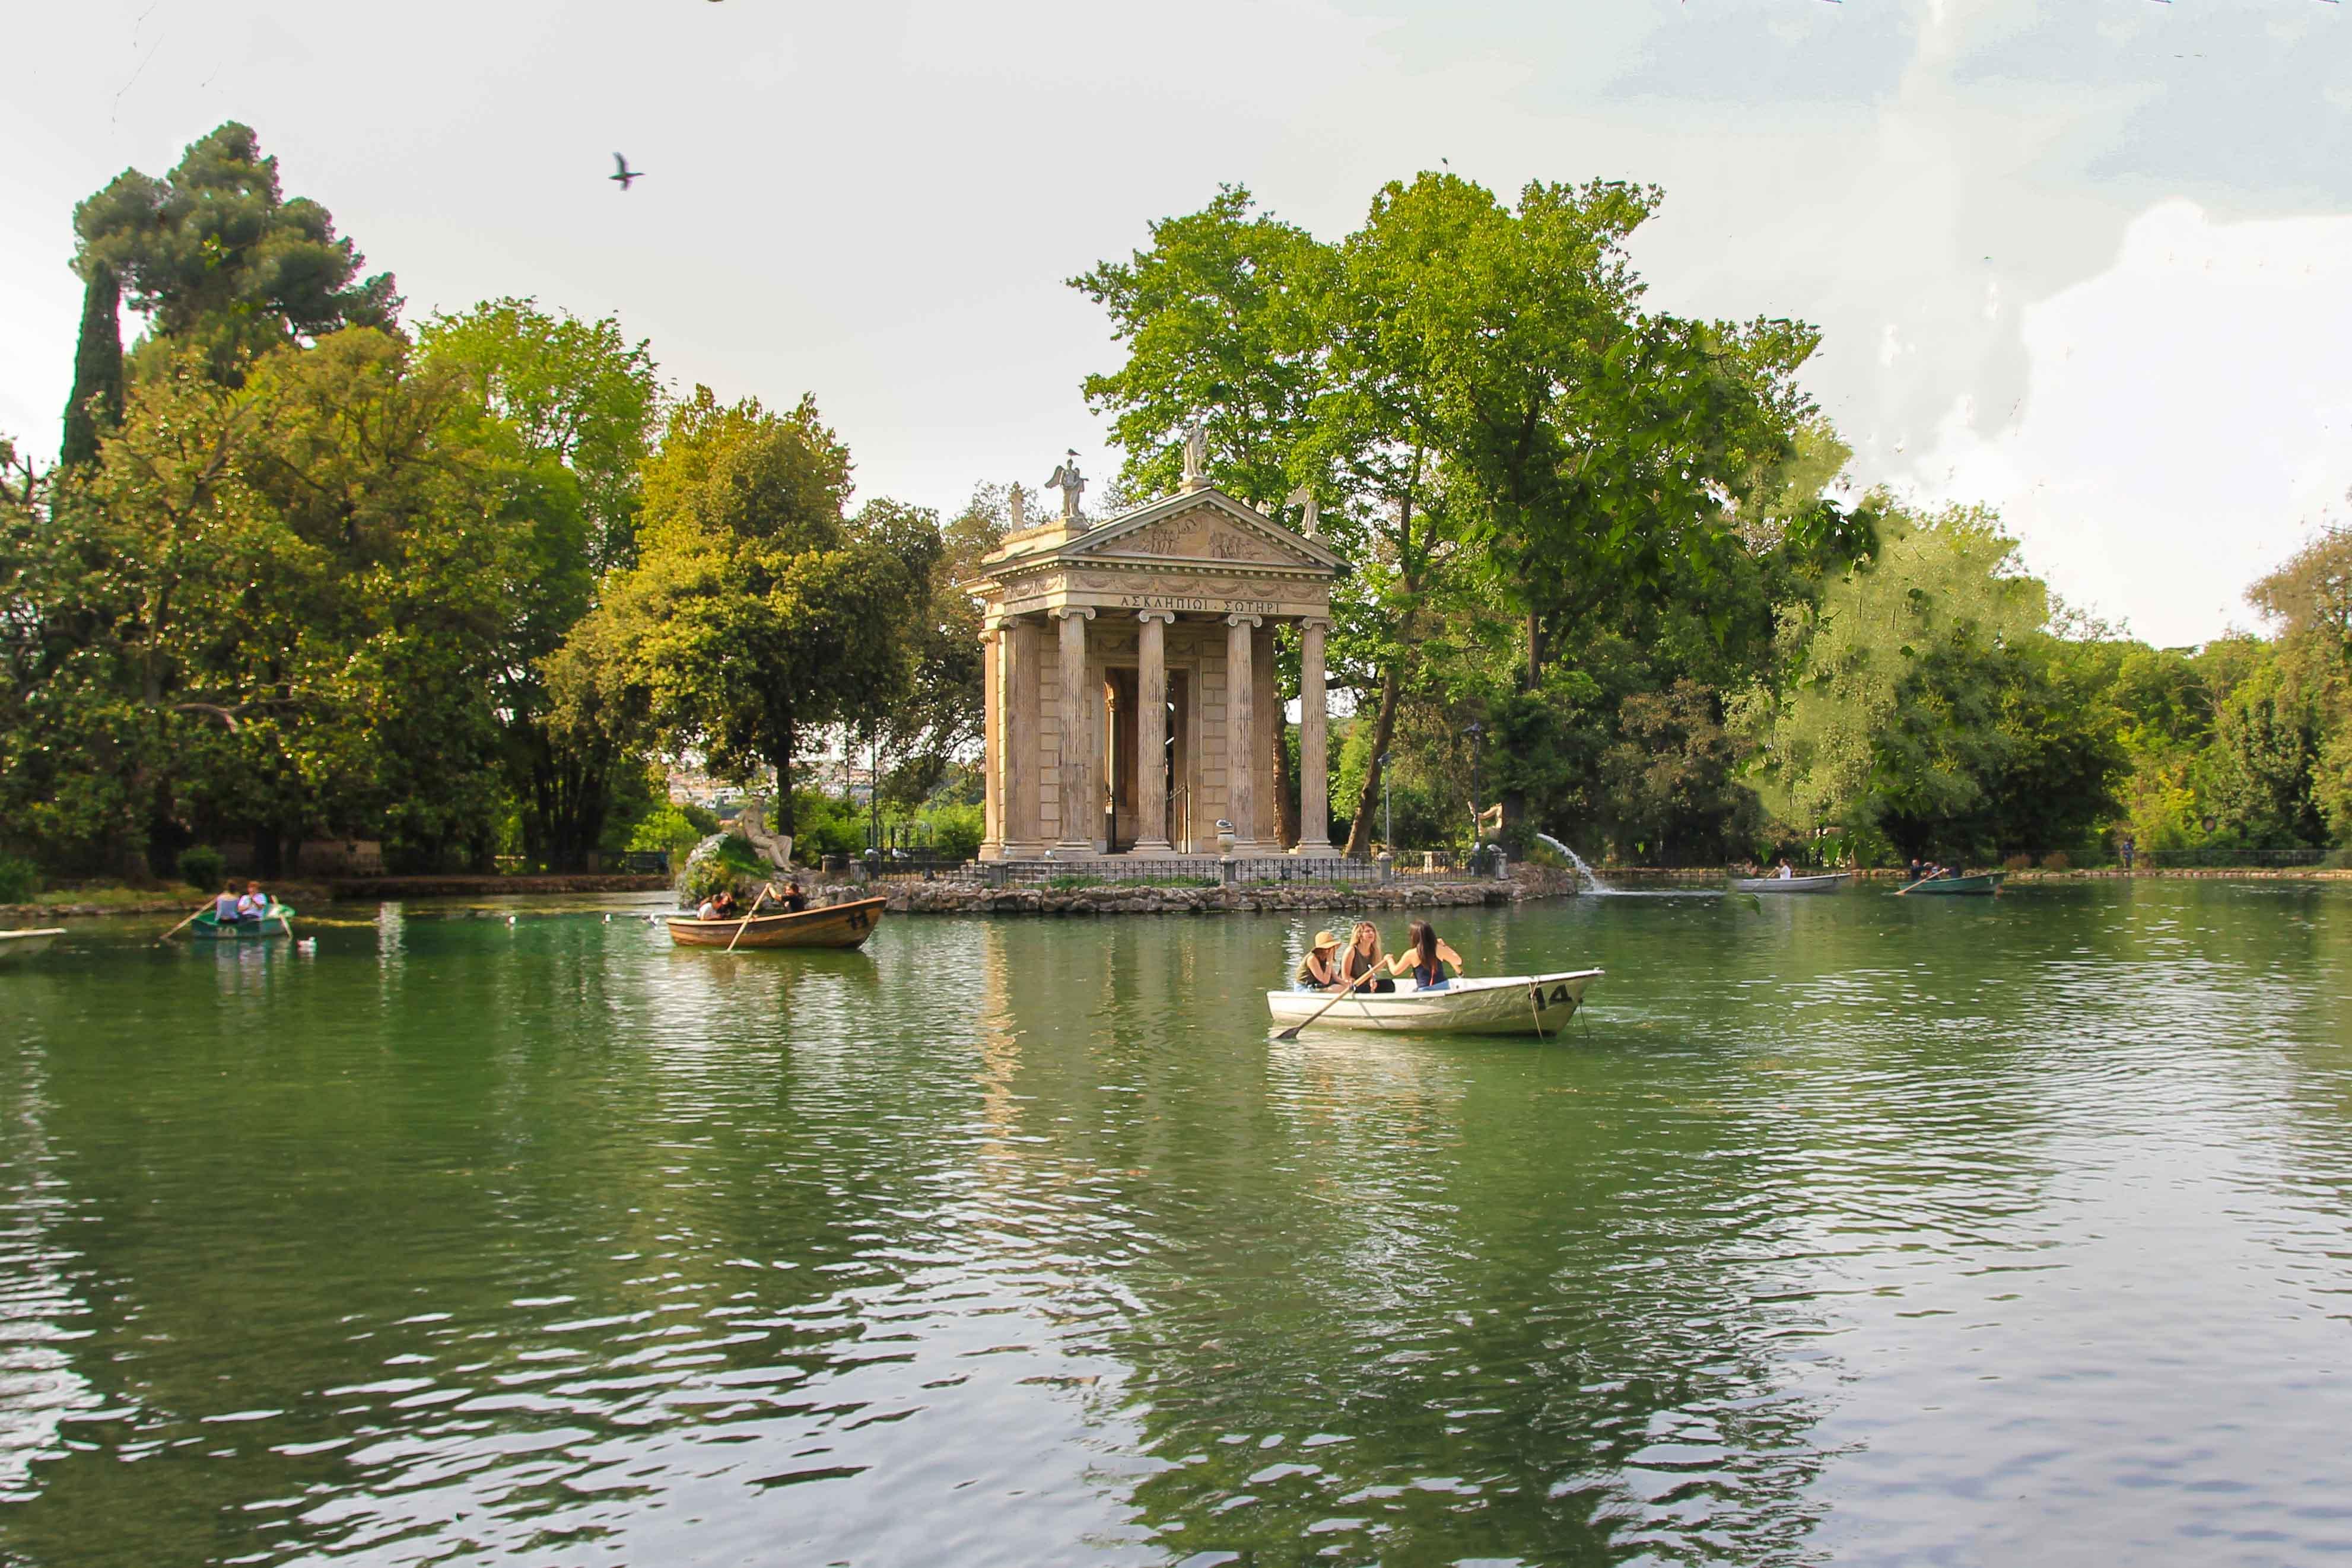 Park Villa Borghese, Rome